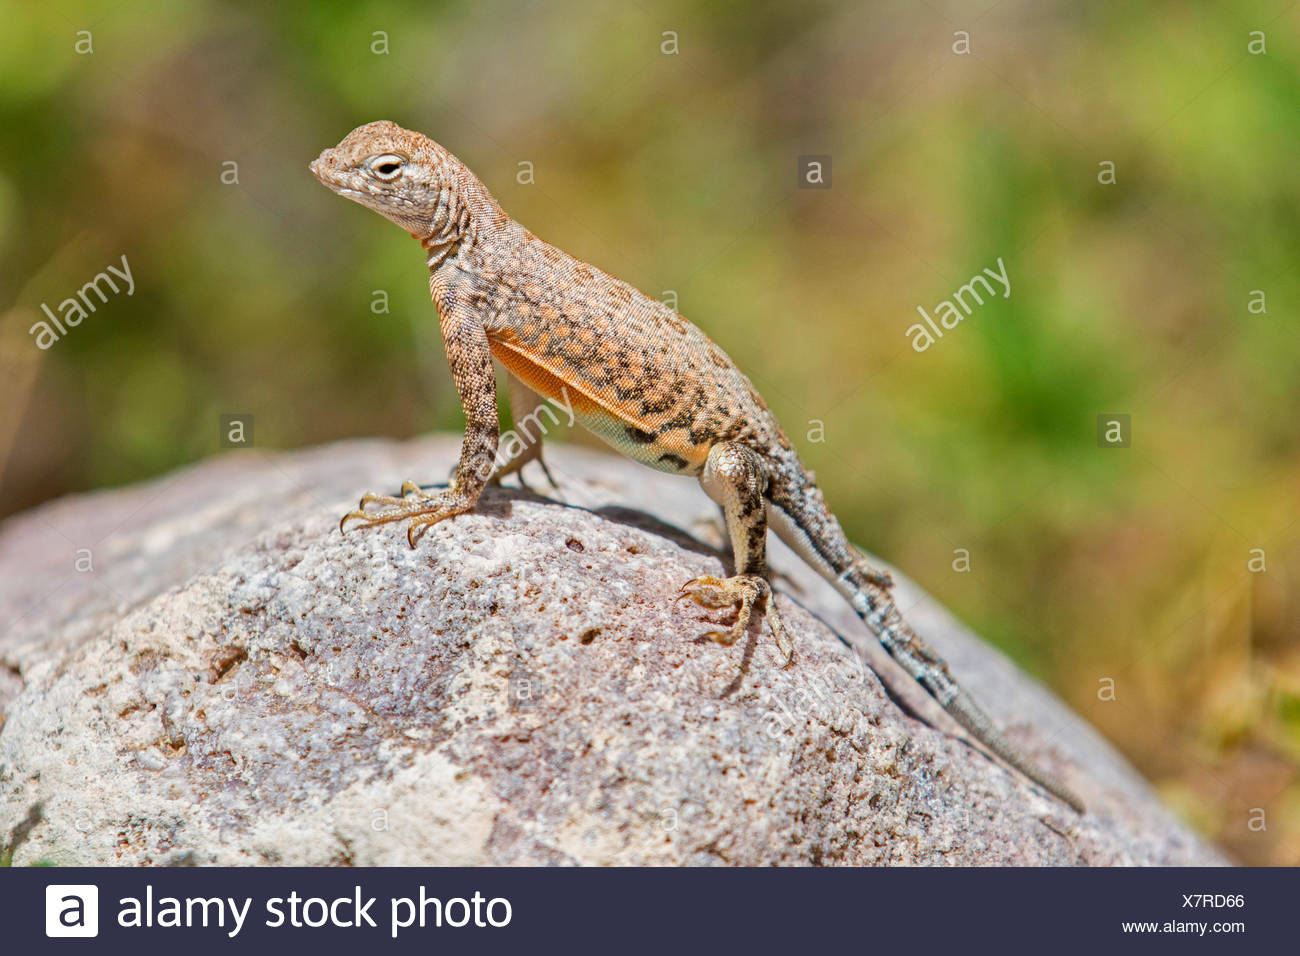 Größere Earless Lizard (vgl. Cophosaurus Texanus), steht auf einem Felsen, USA, Arizona Stockbild